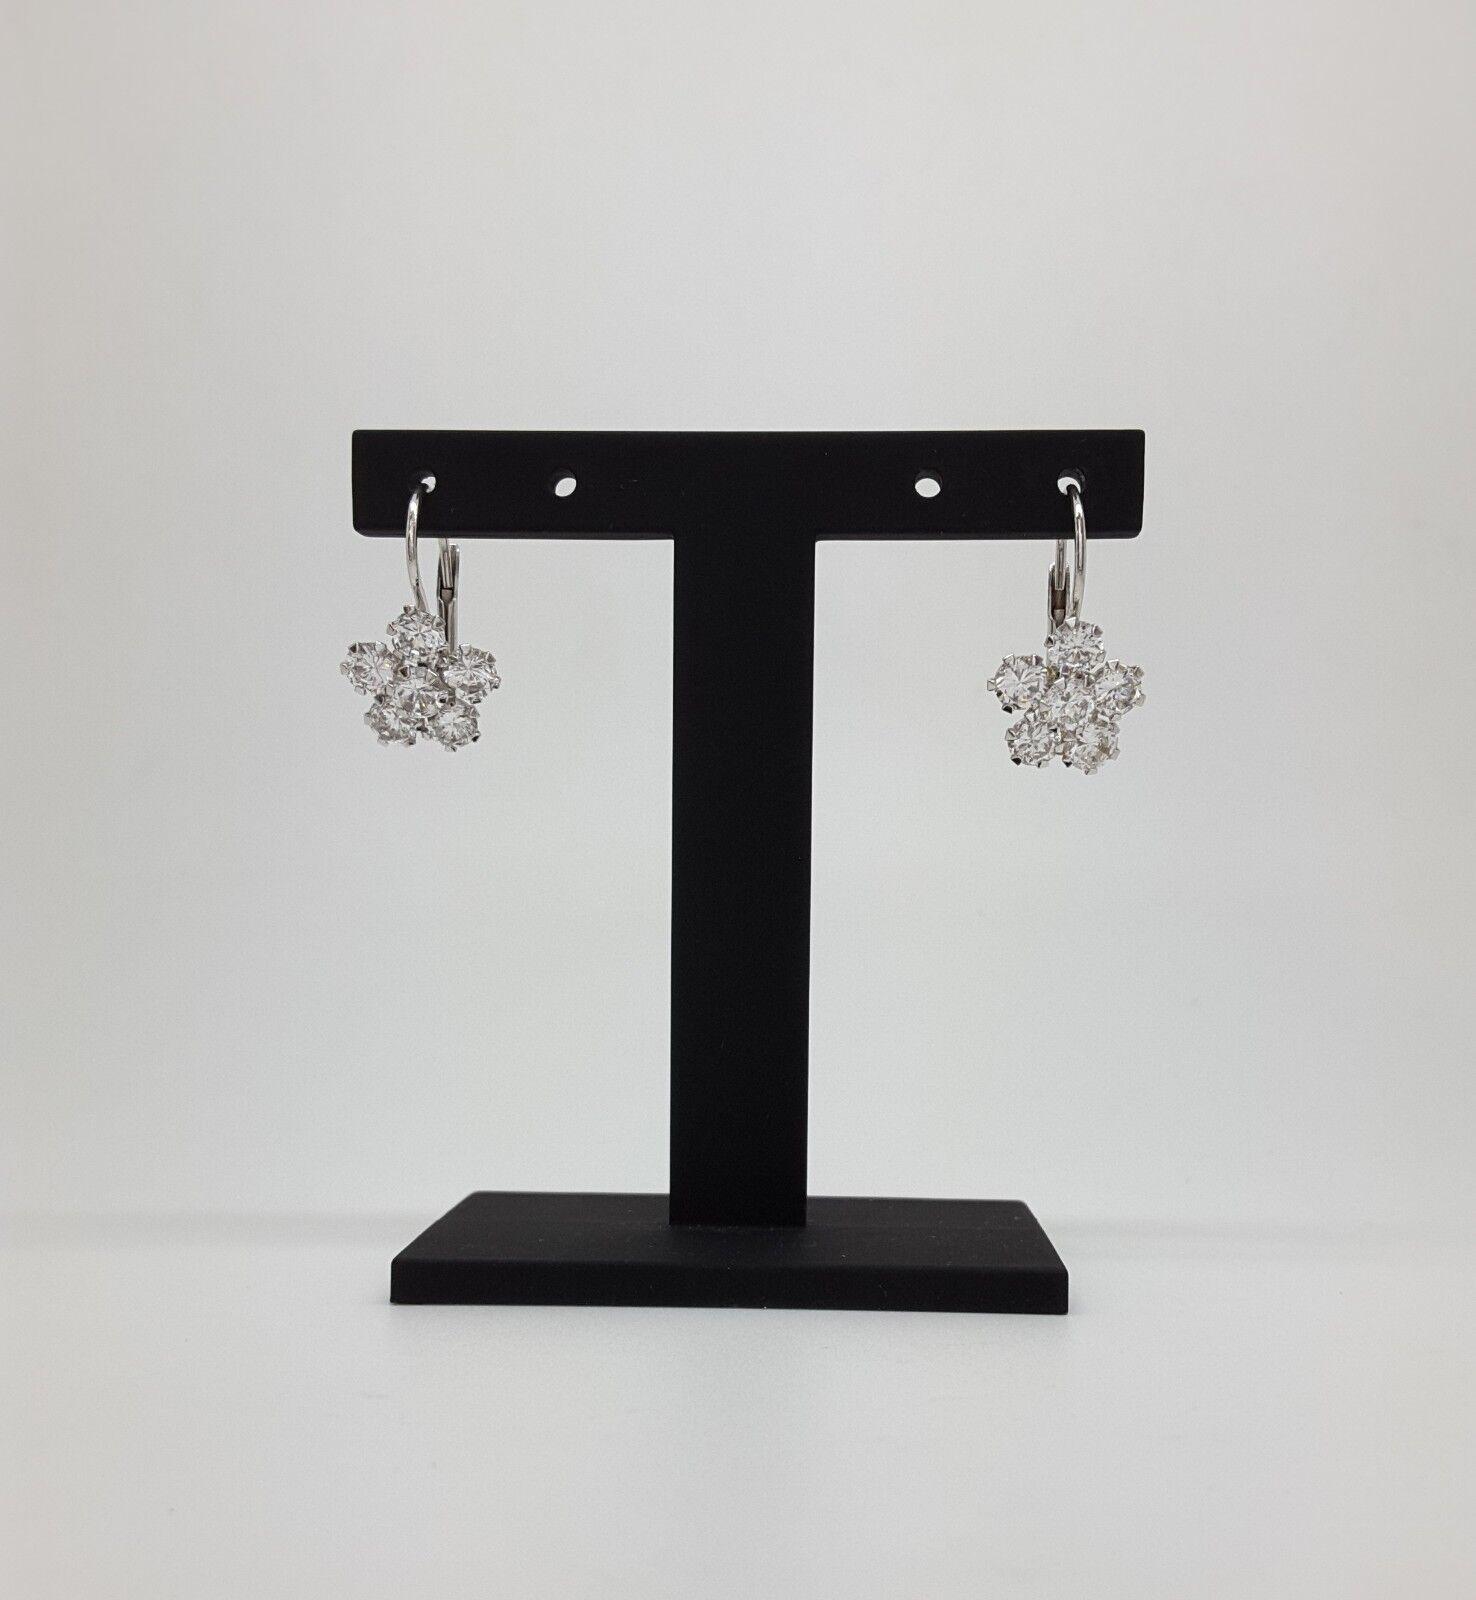 Miran 140905 18K White gold CZ Dangling Flower Earrings 2.8g RRP  239